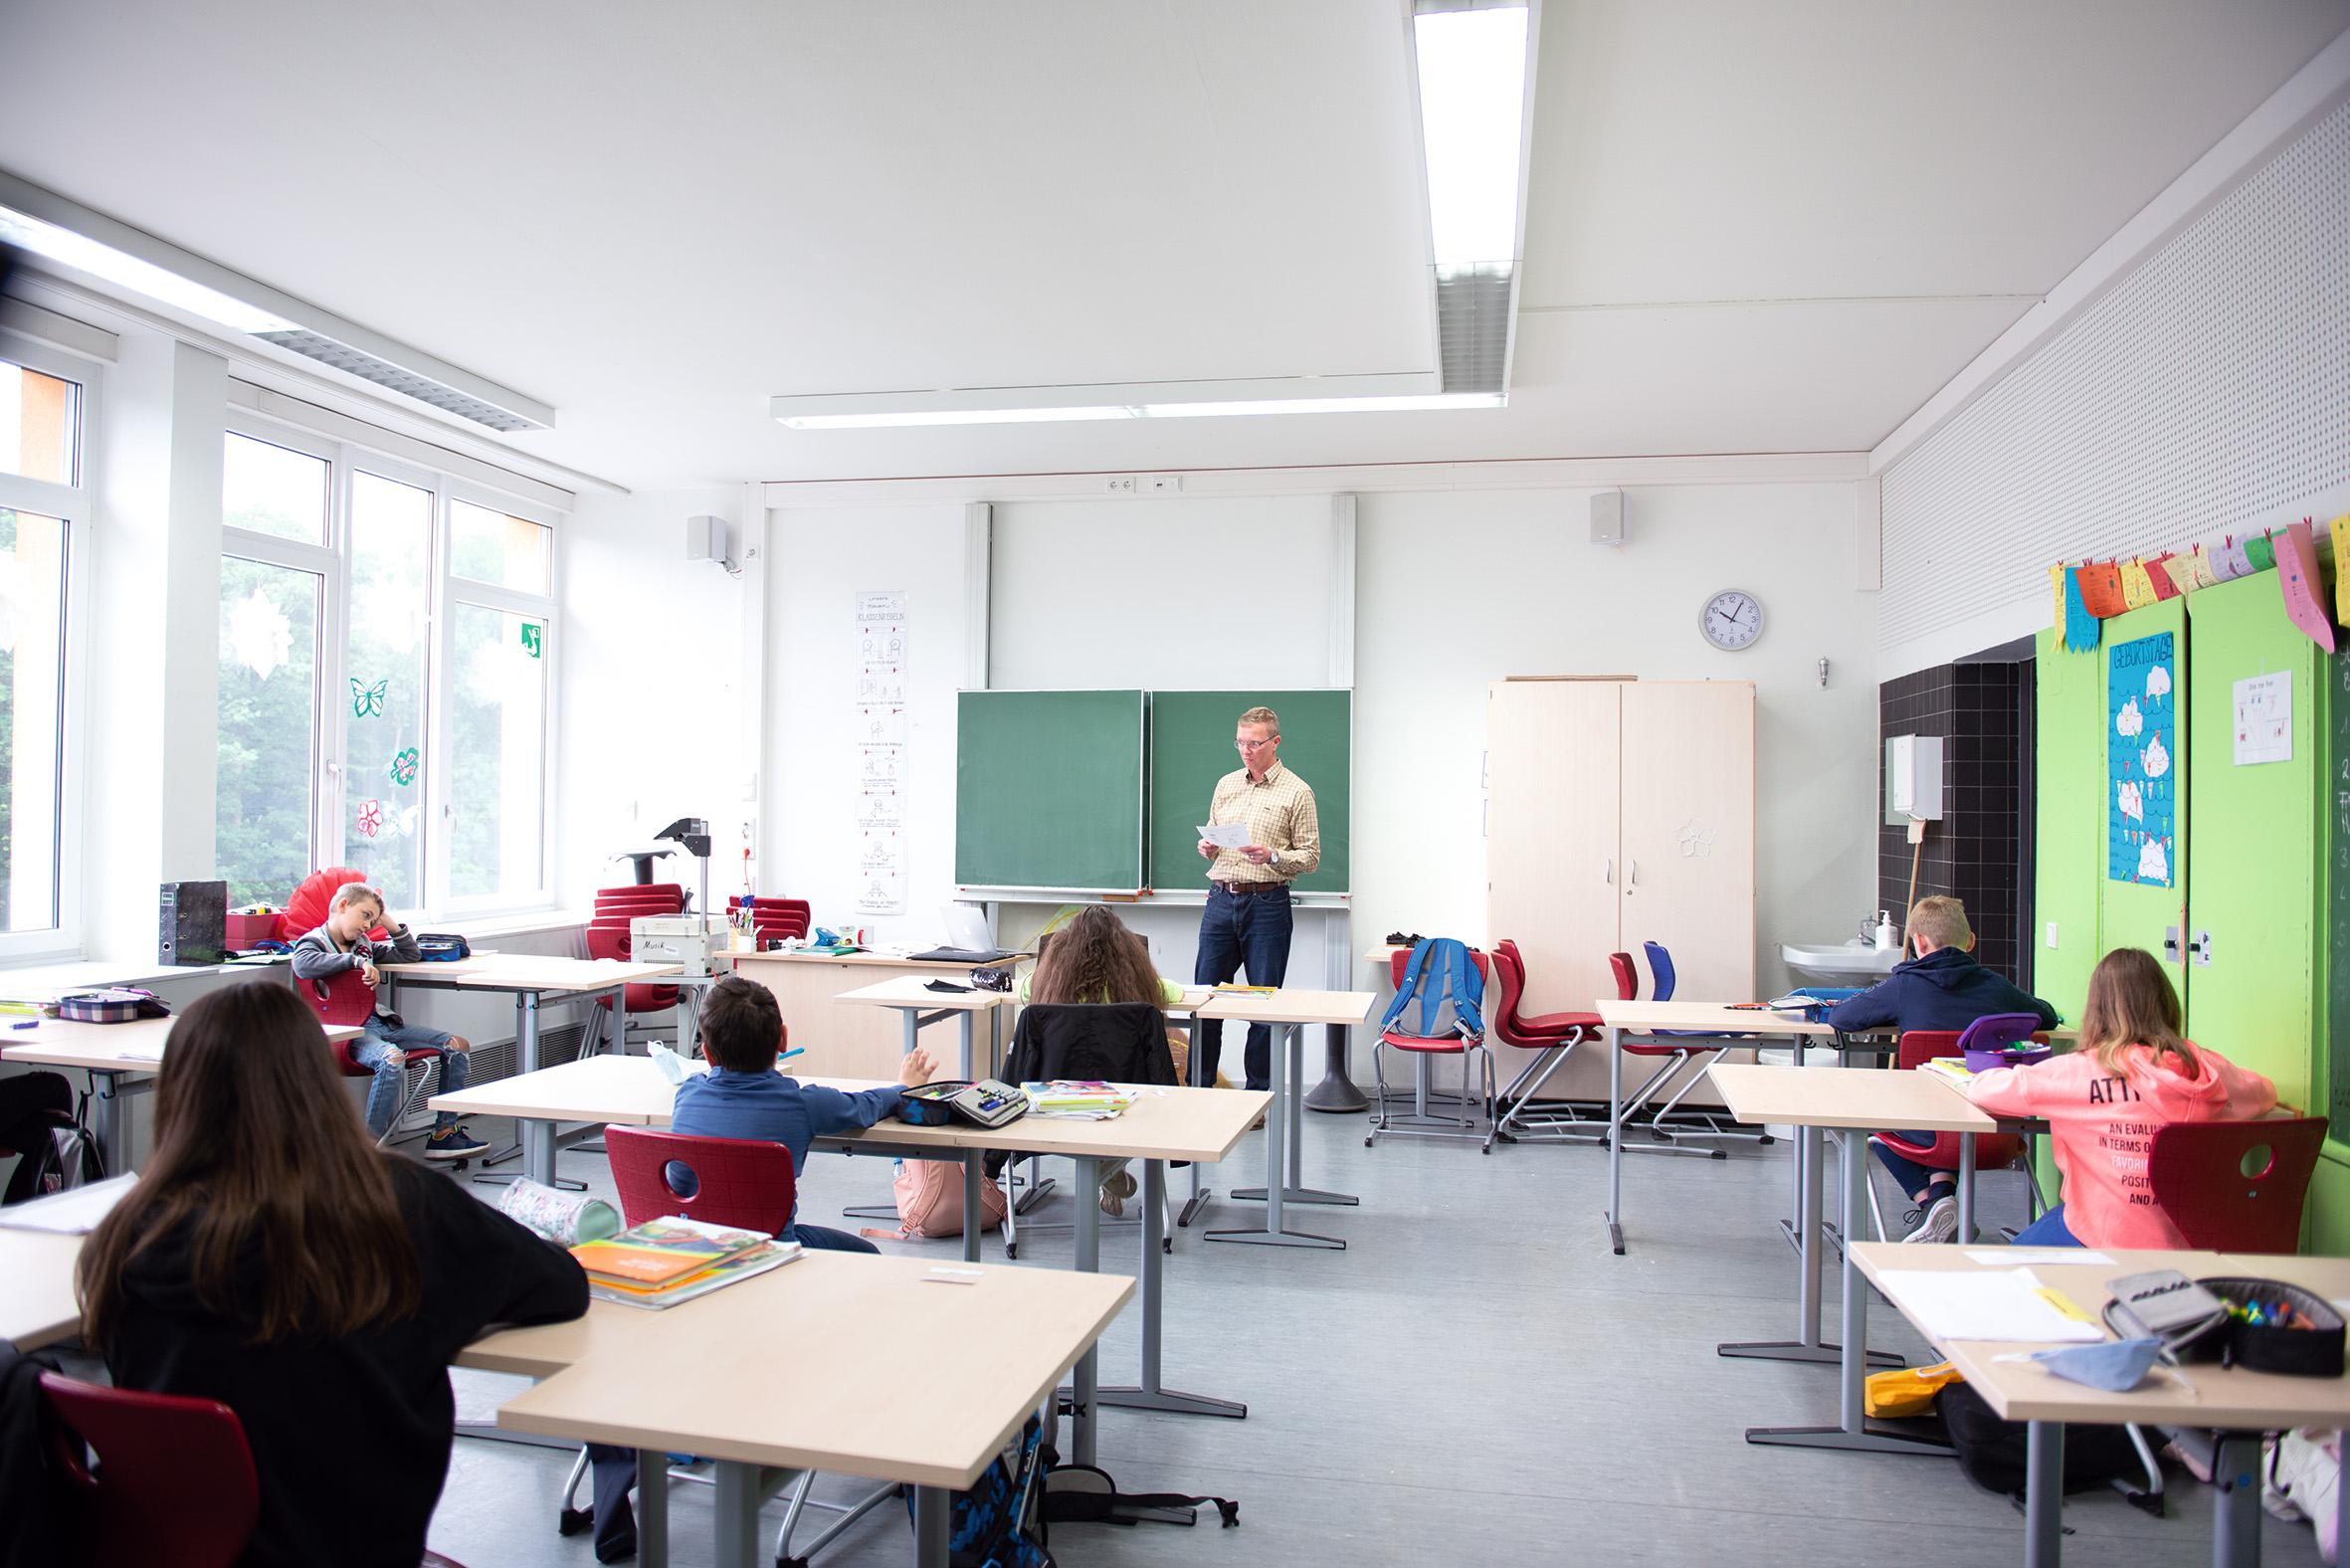 GS Neviges Klassenzimmer